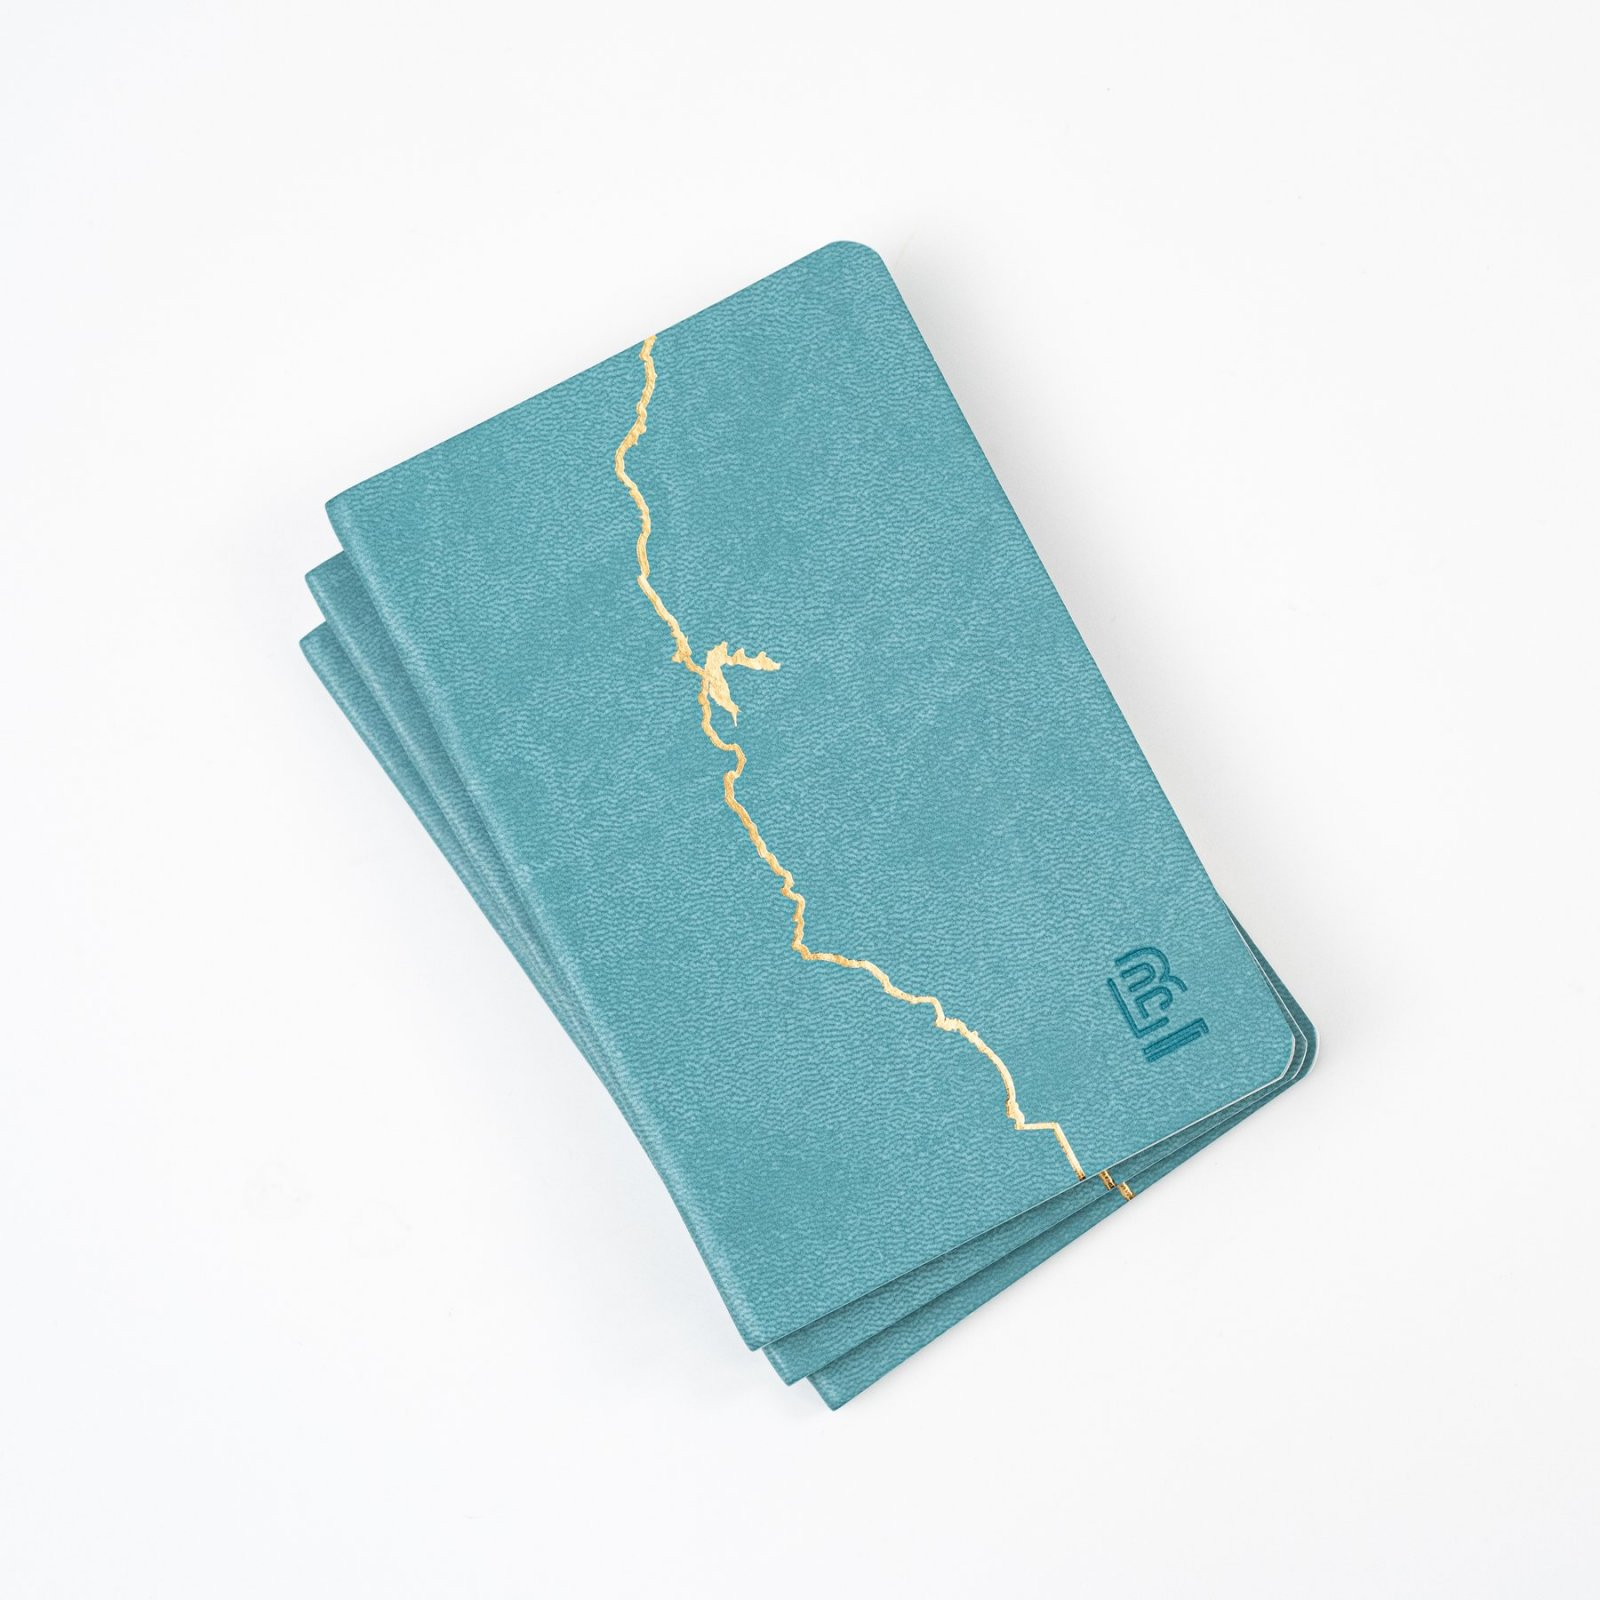 Blackwing Clutch 840 Volumes Notebooks (Set of 3 - Blank x1, Ruled x1, Dot Grid x1)